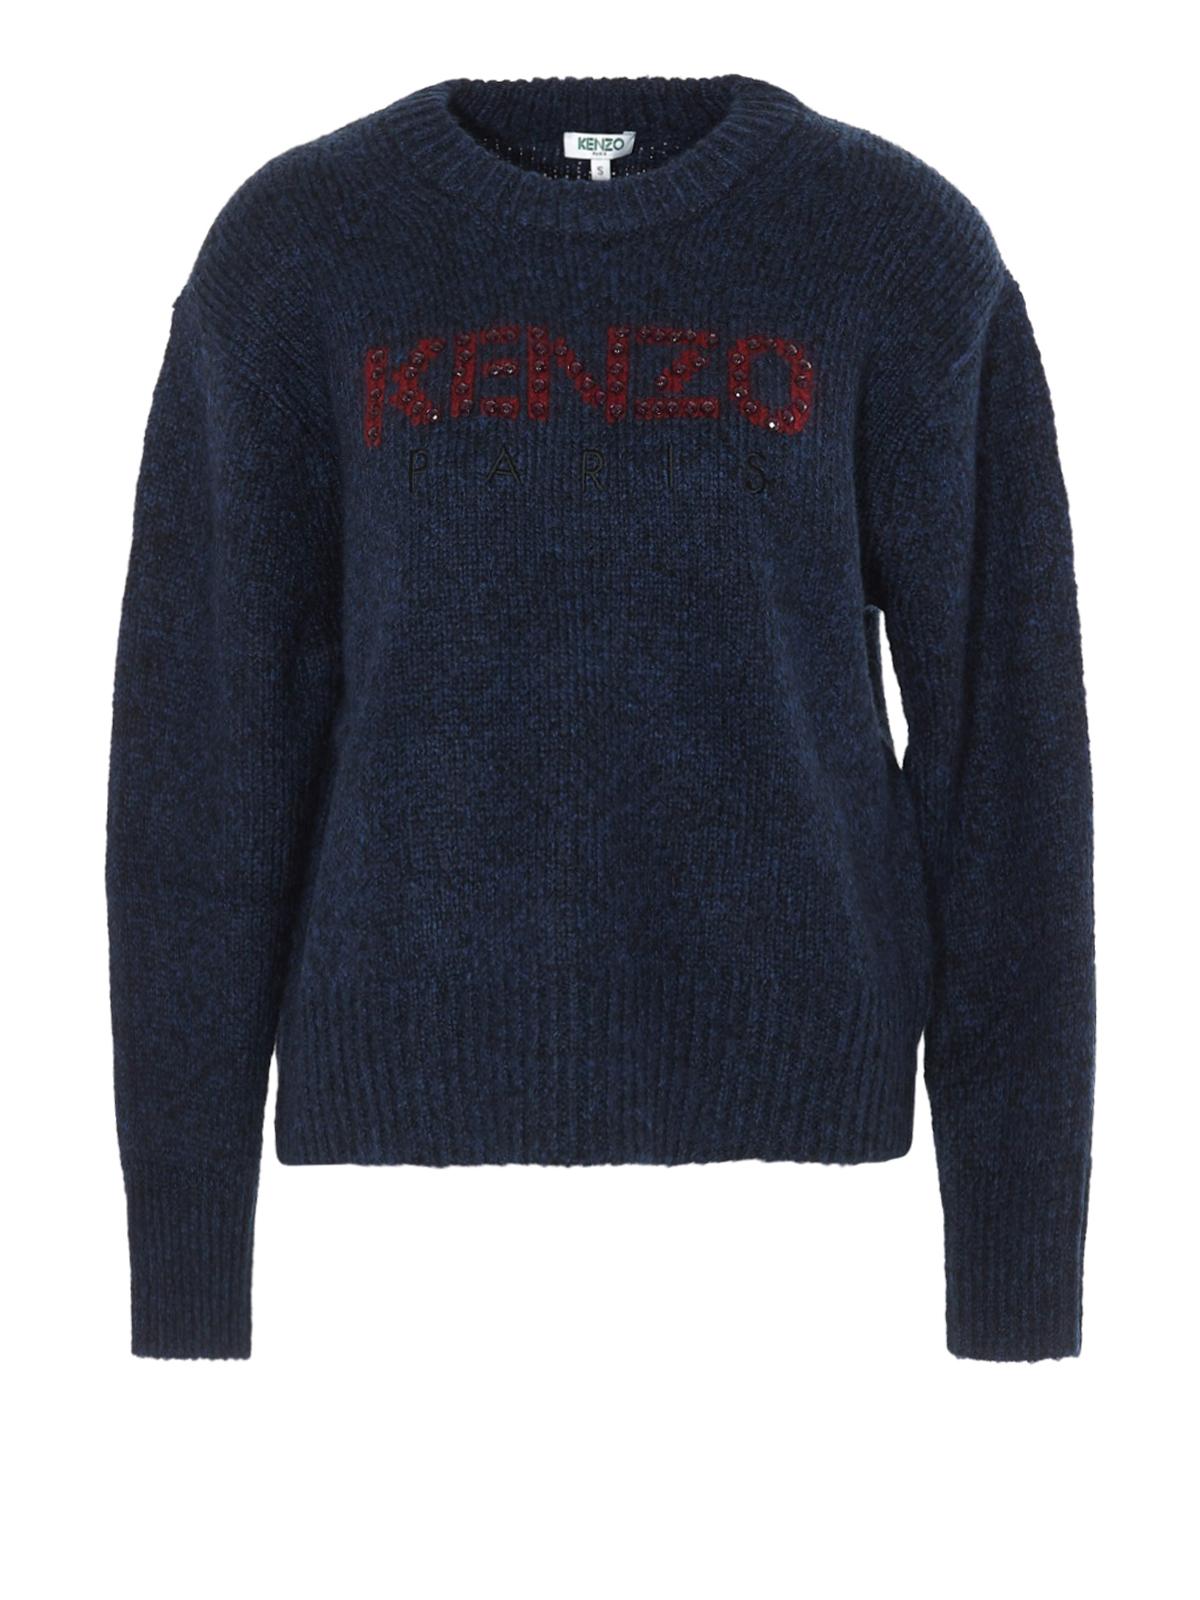 Kenzo Rhinestone Logo Intarsia Sweater In Dark Blue